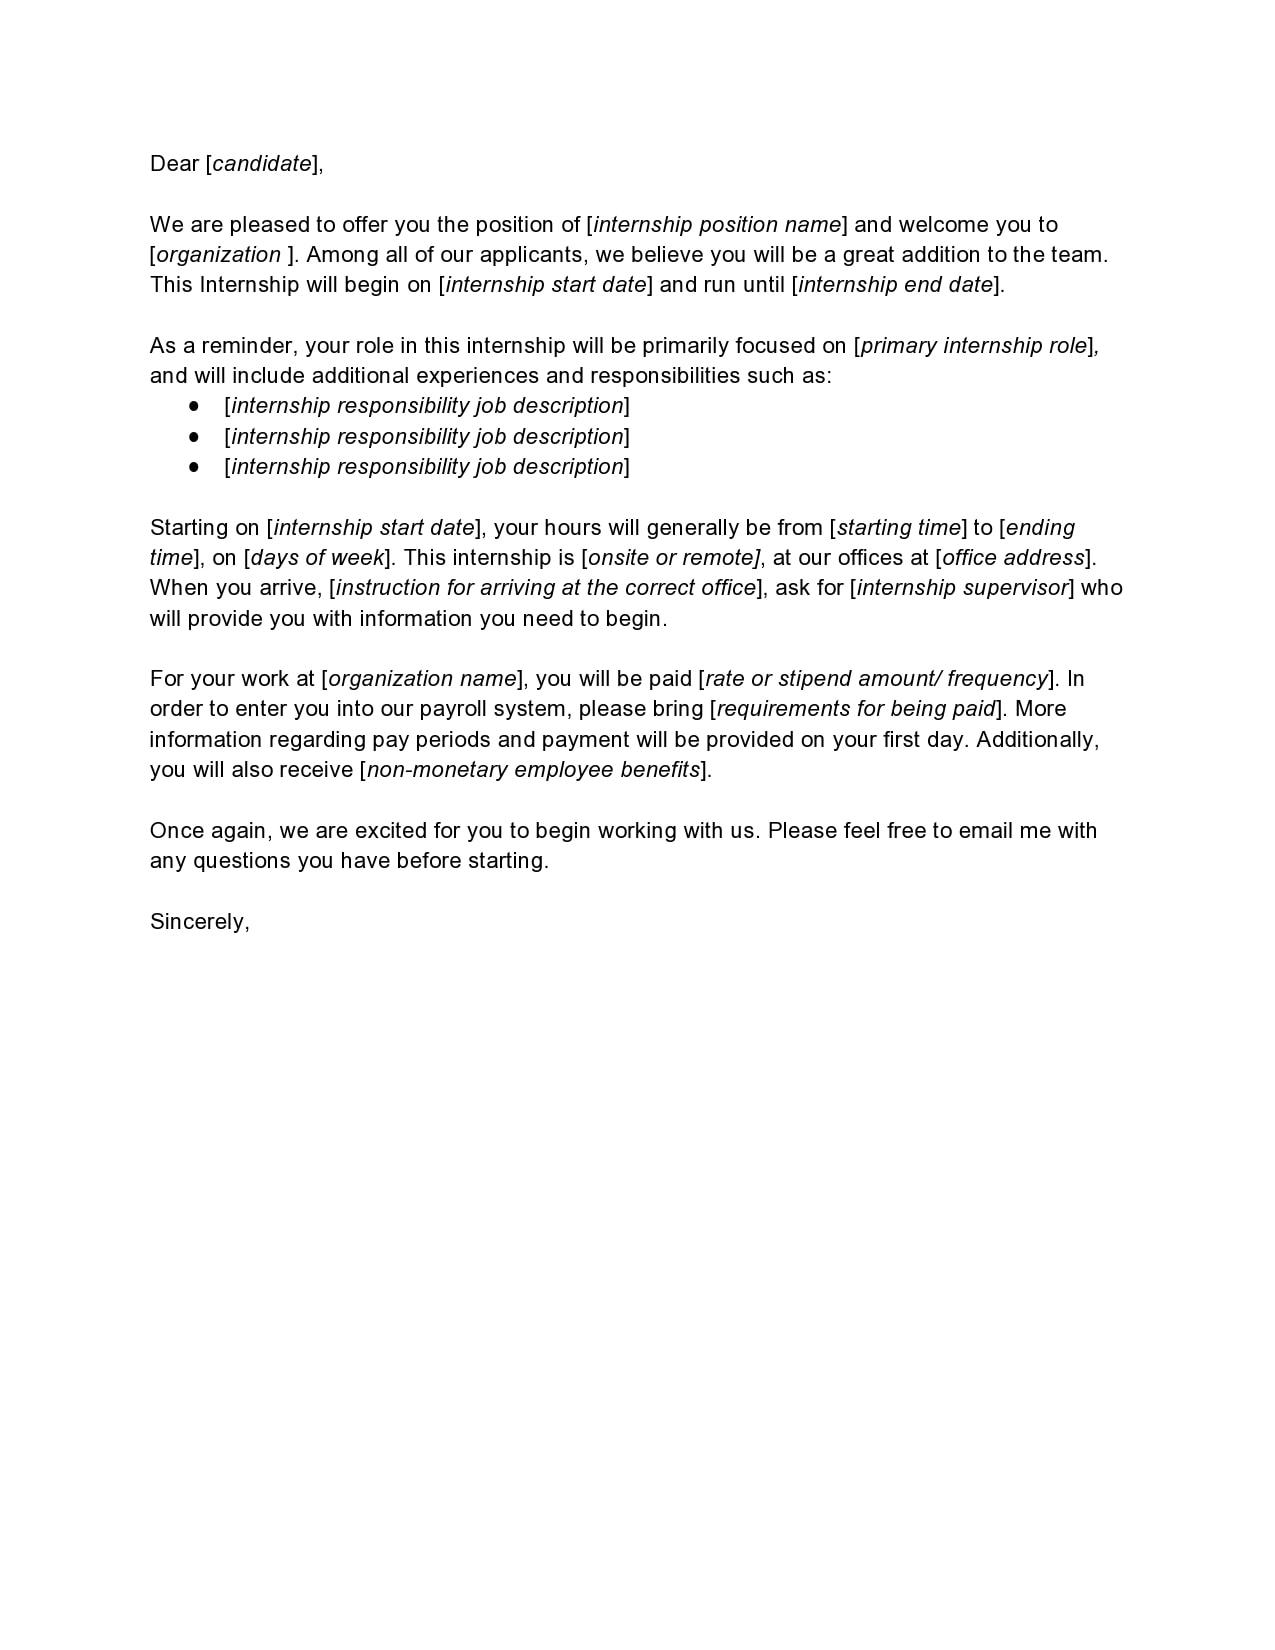 internship offer letter 24